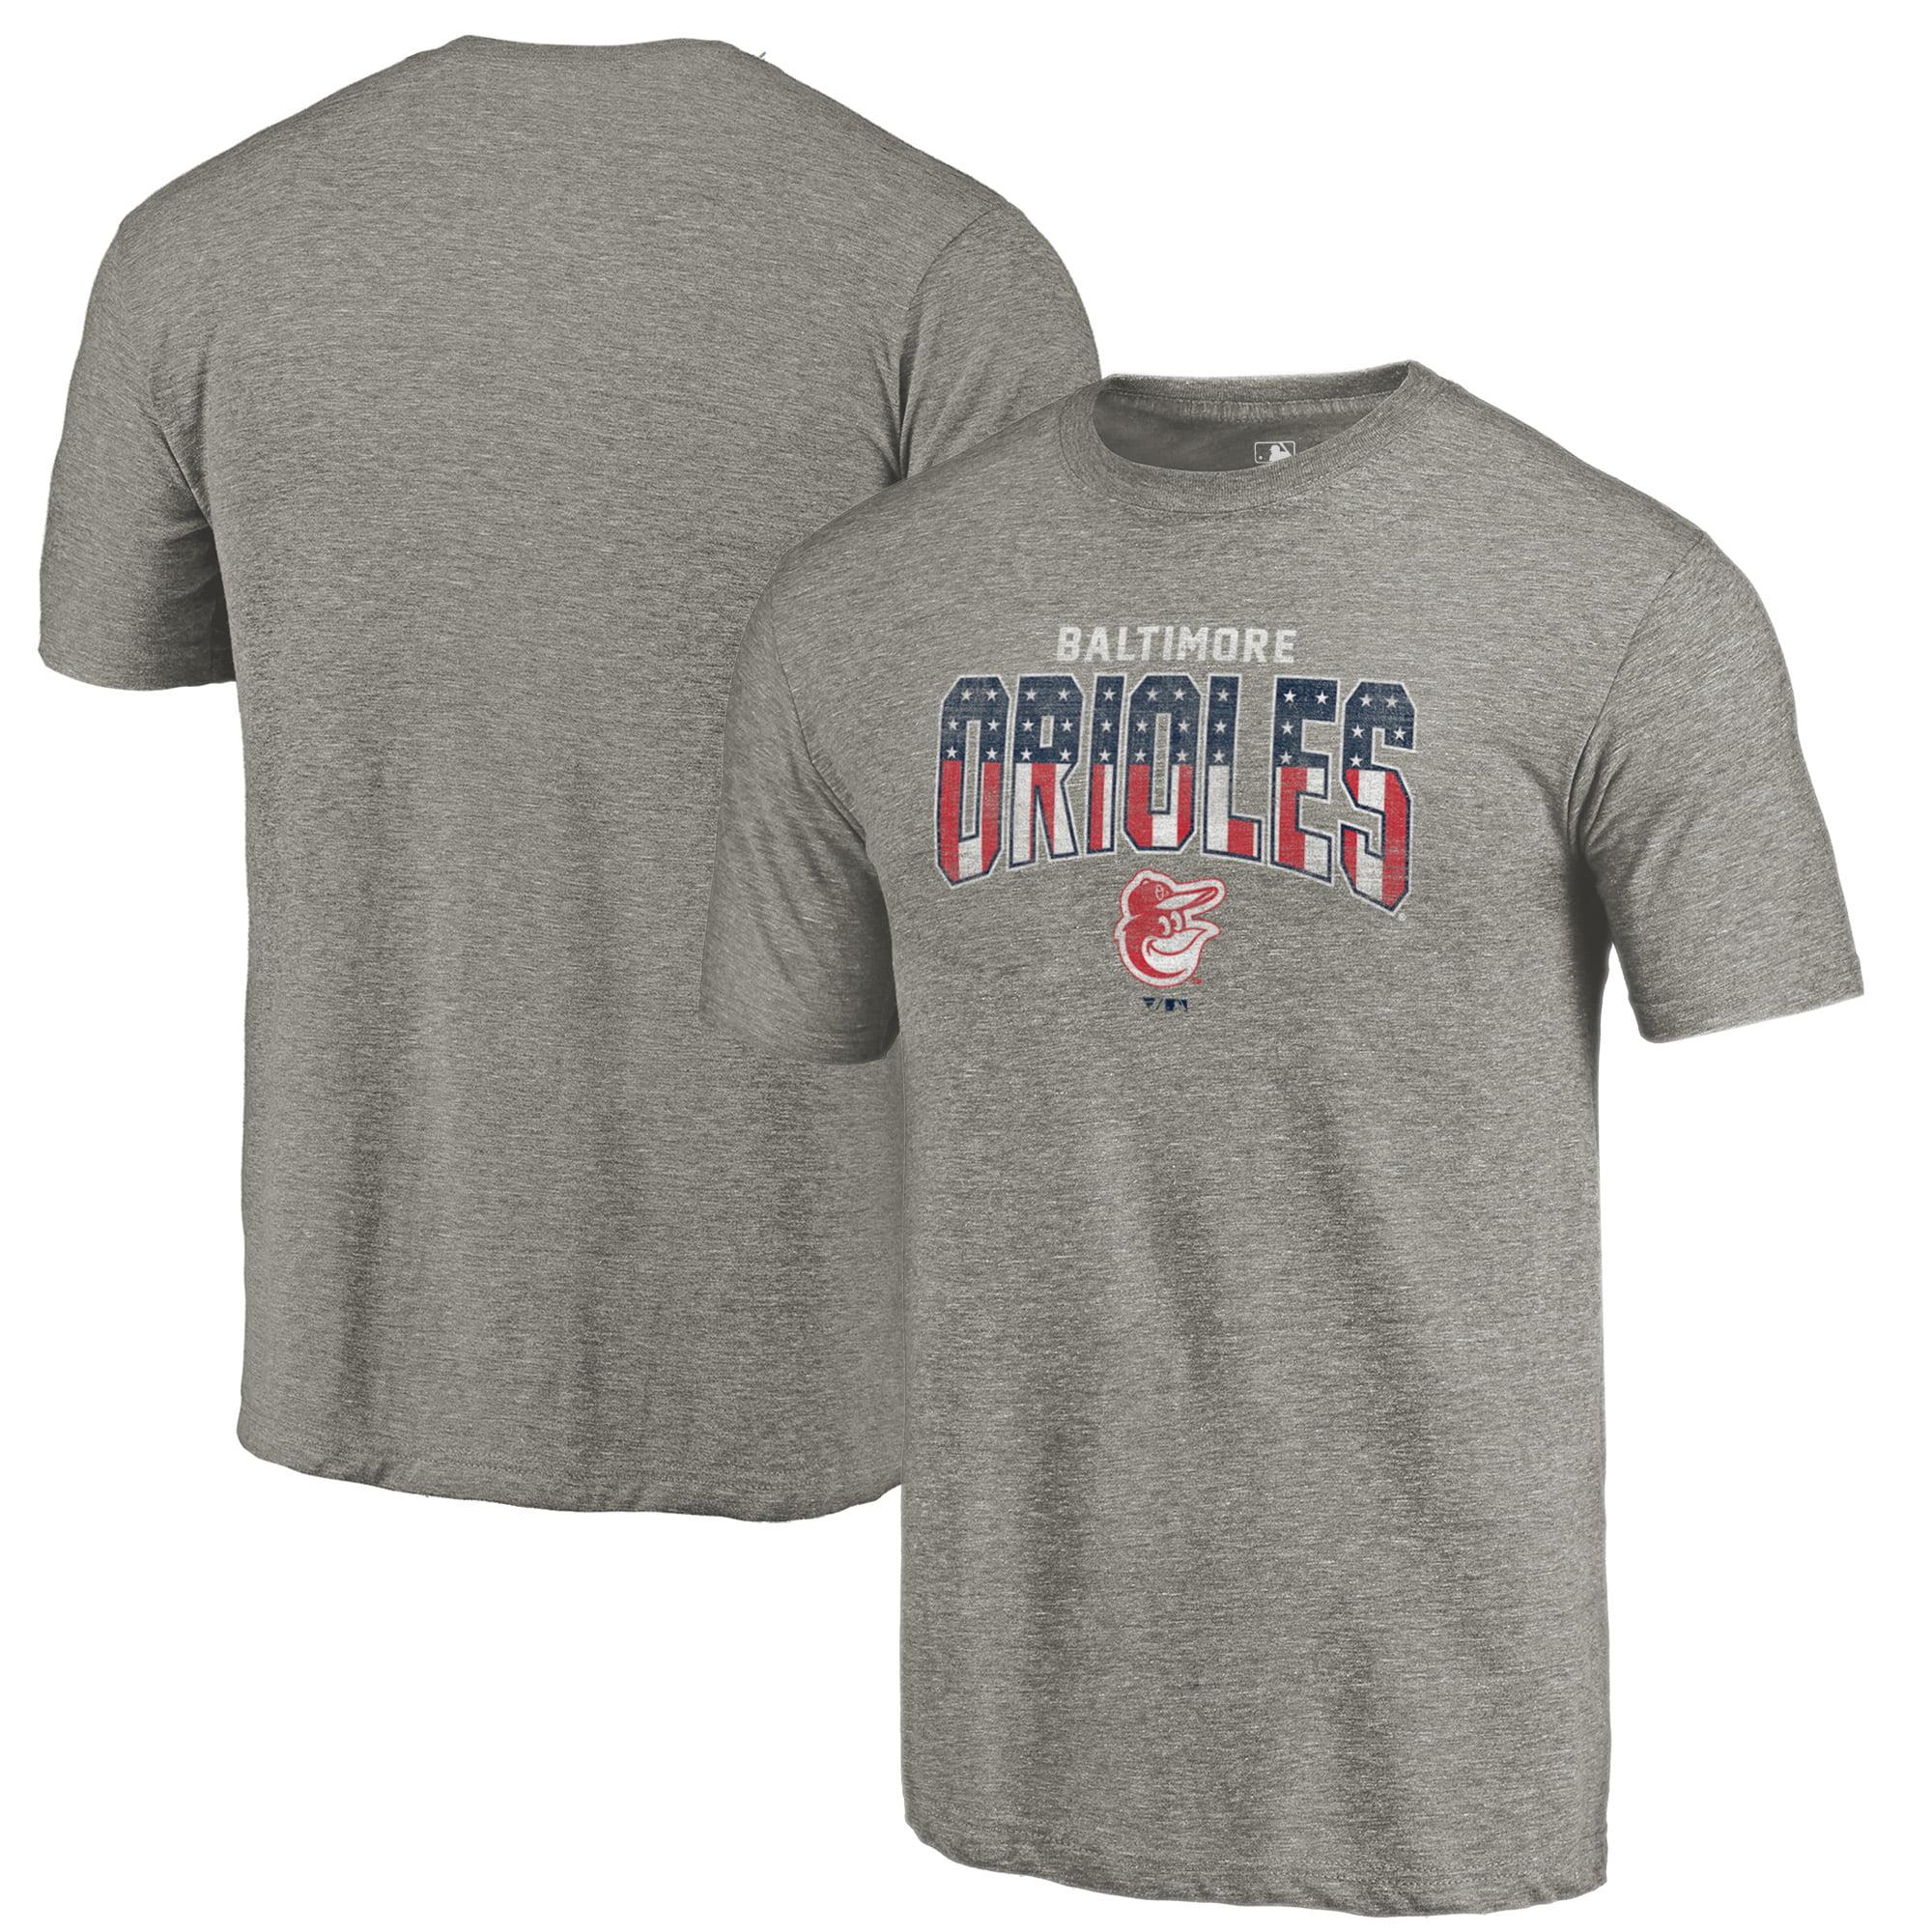 Baltimore Orioles Fanatics Branded 2018 Stars & Stripes Freedom Tri-Blend T-Shirt - Gray